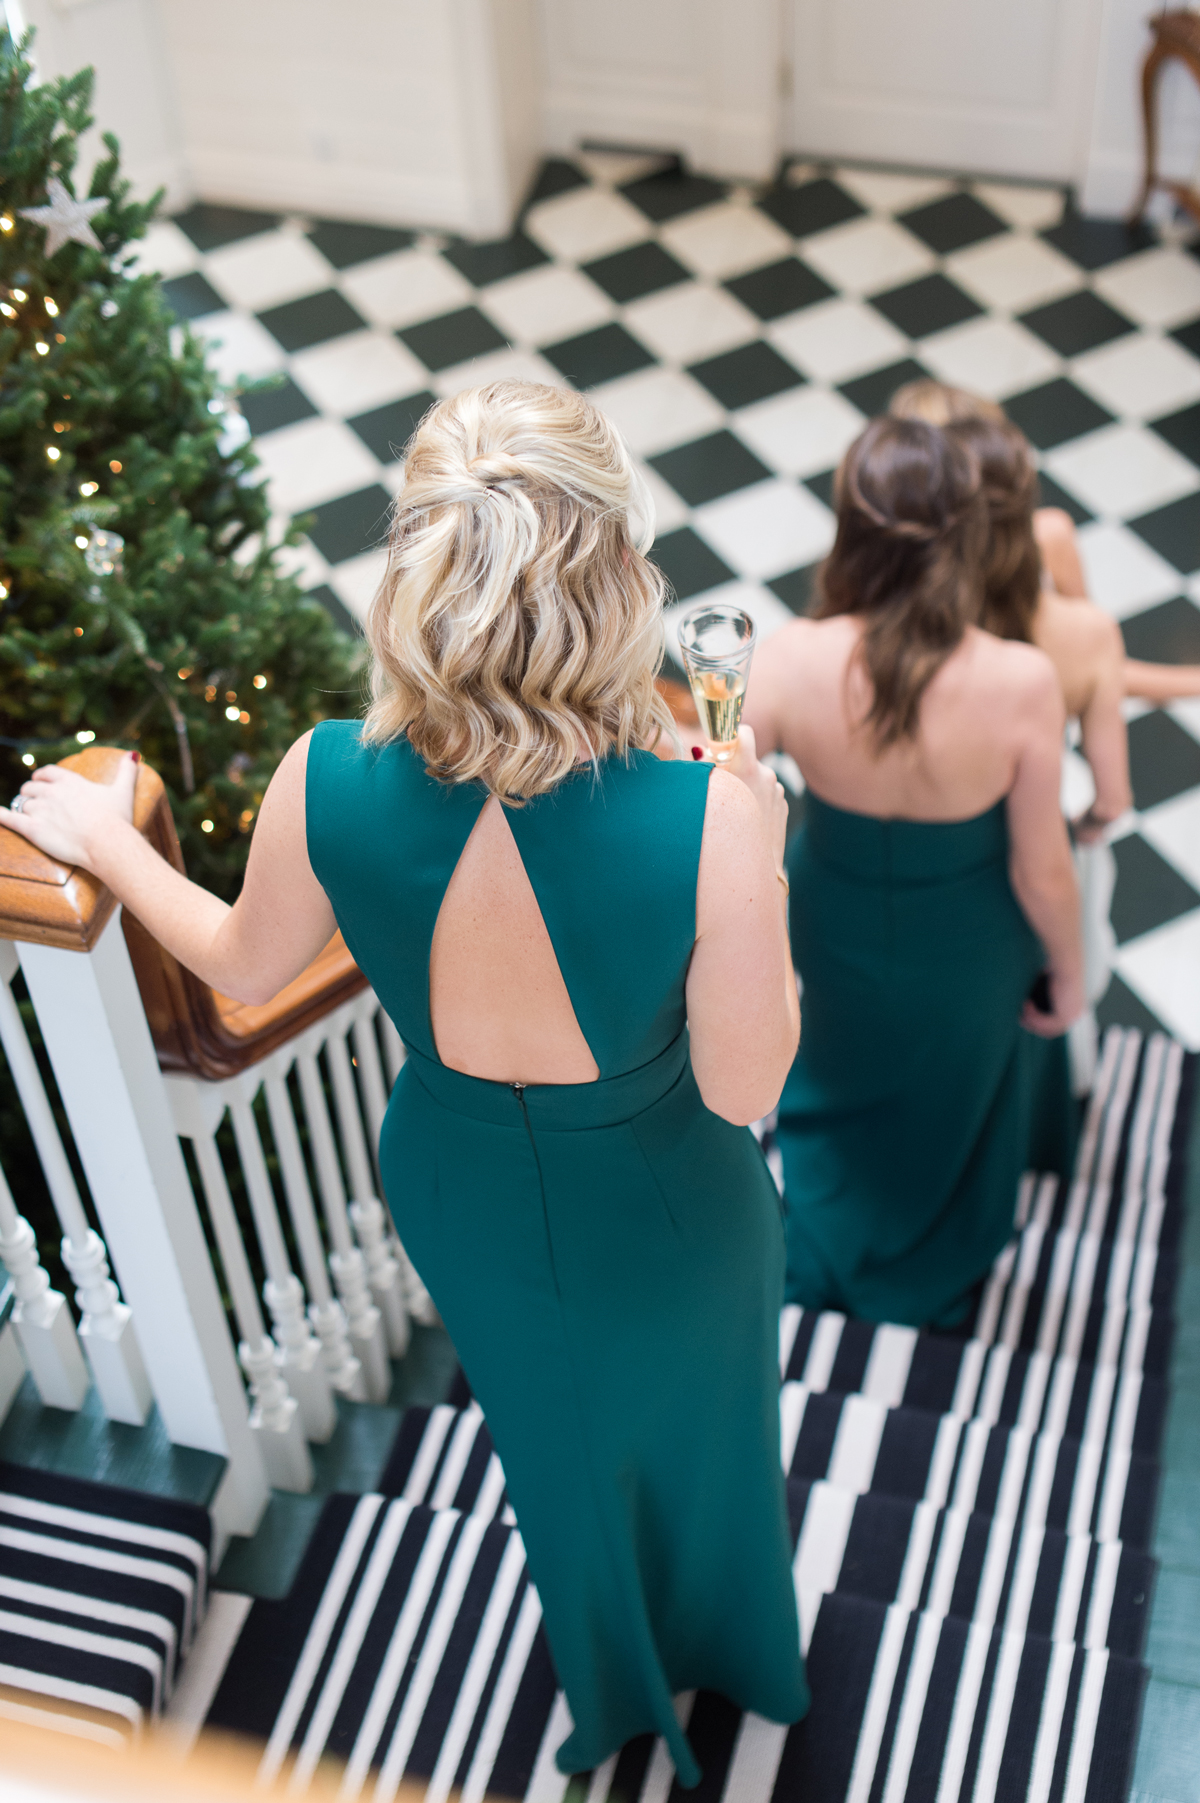 winter wedding guest attire pine green bridesmaids dresses